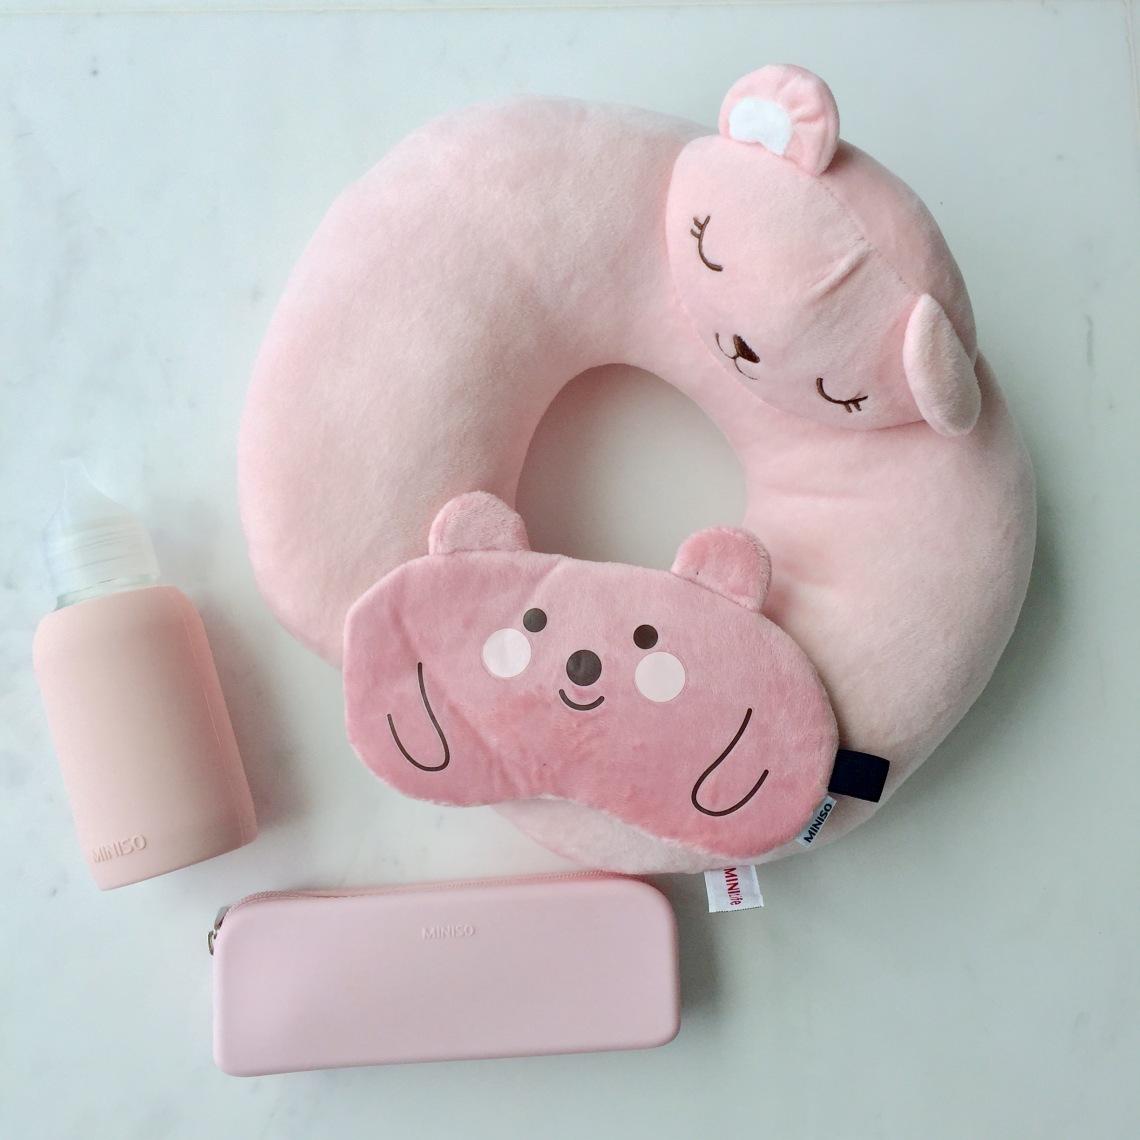 Miniso pink travel essentials